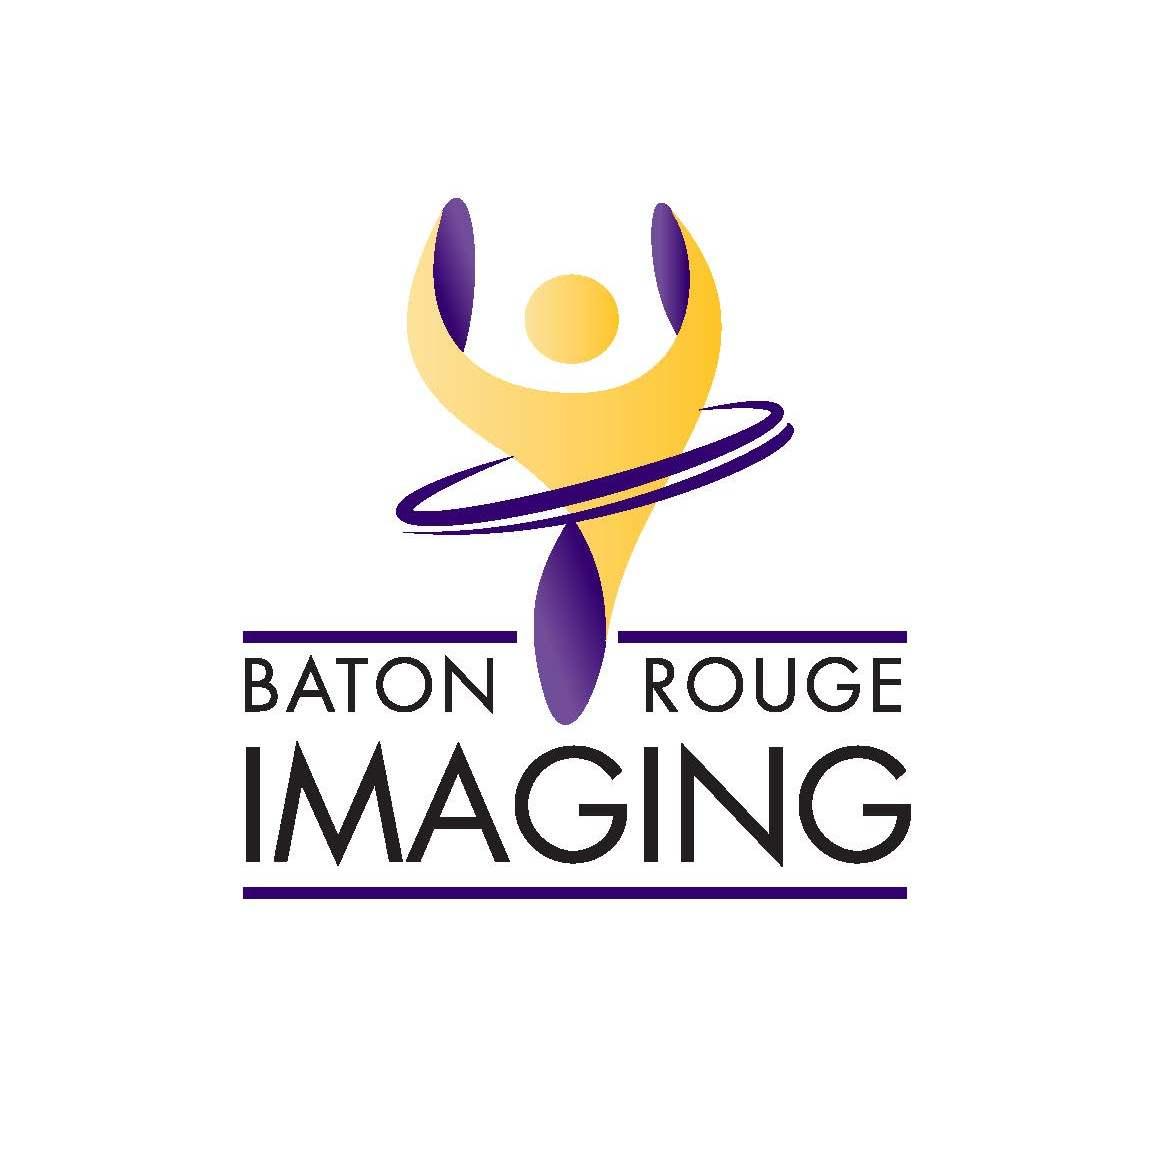 Baton Rouge Imaging